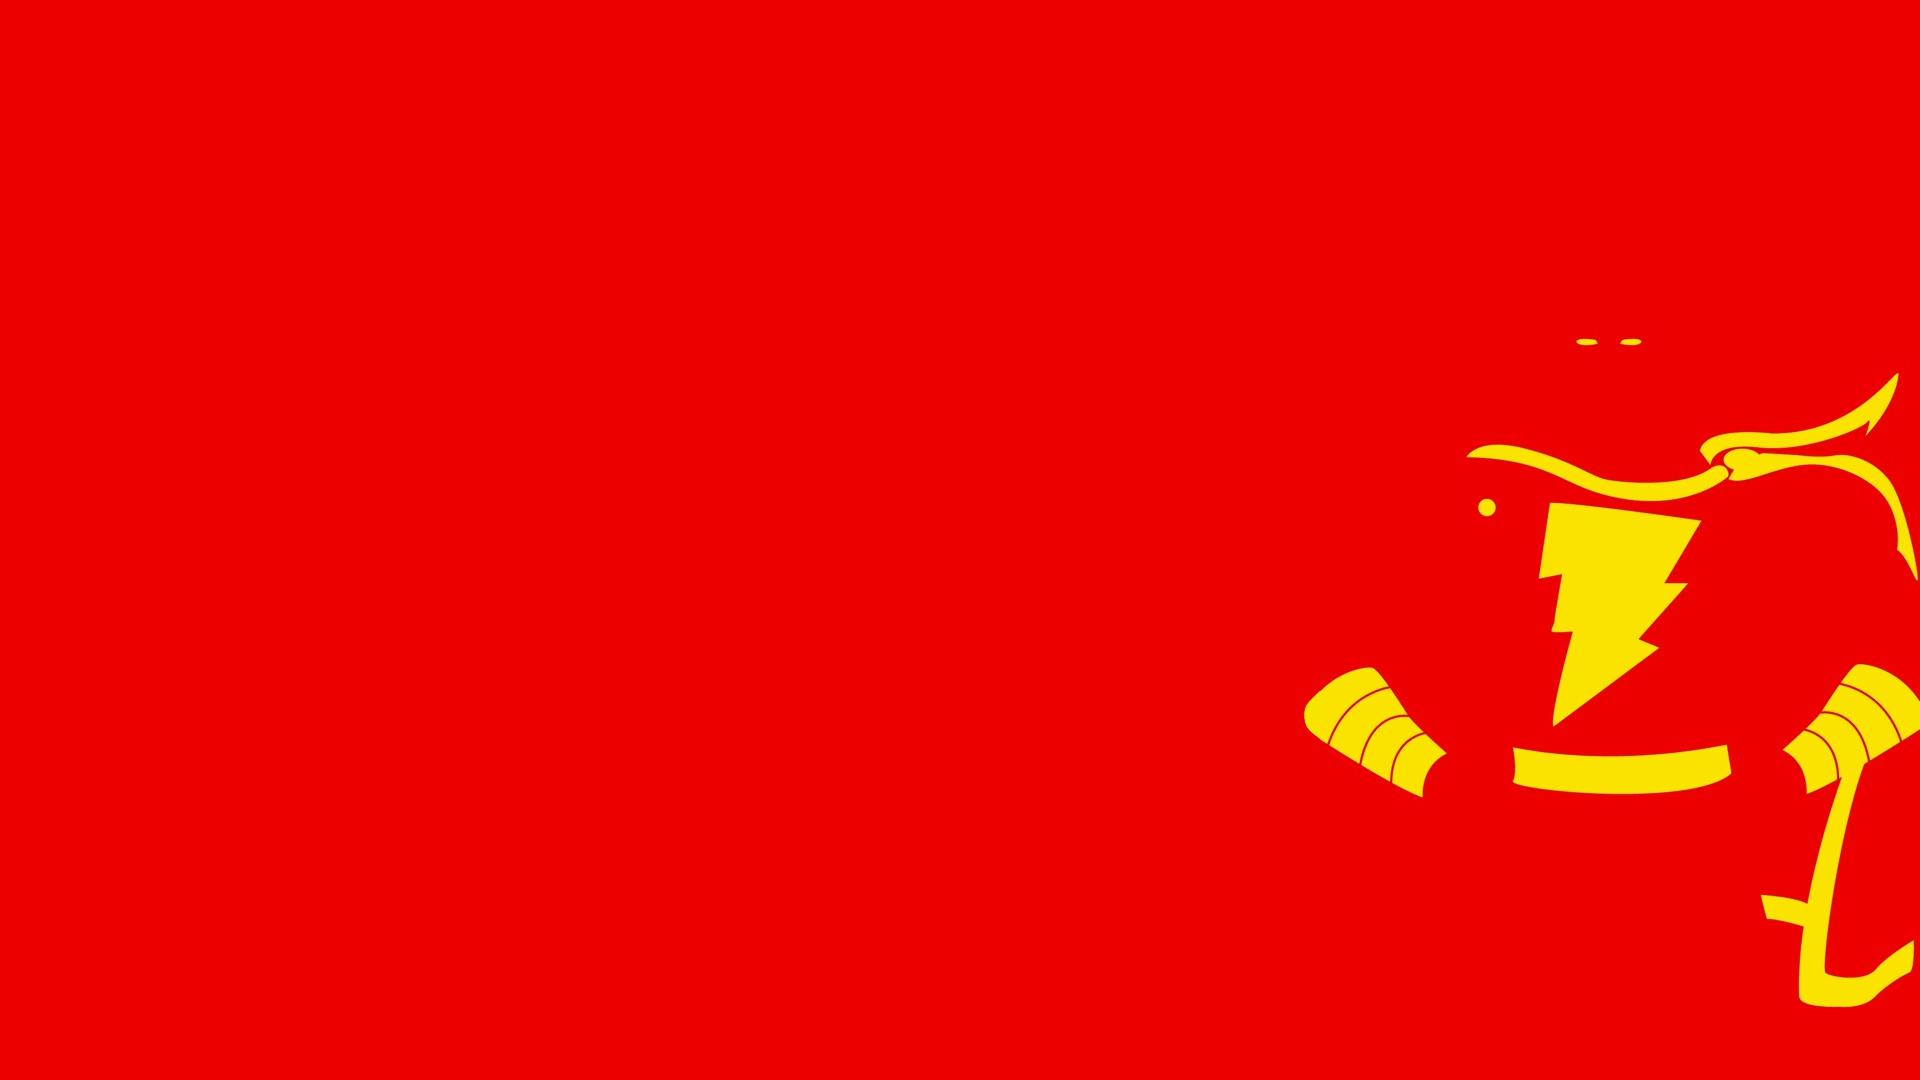 Shazam Hd Wallpaper Background Image 1920x1080 Id 443632